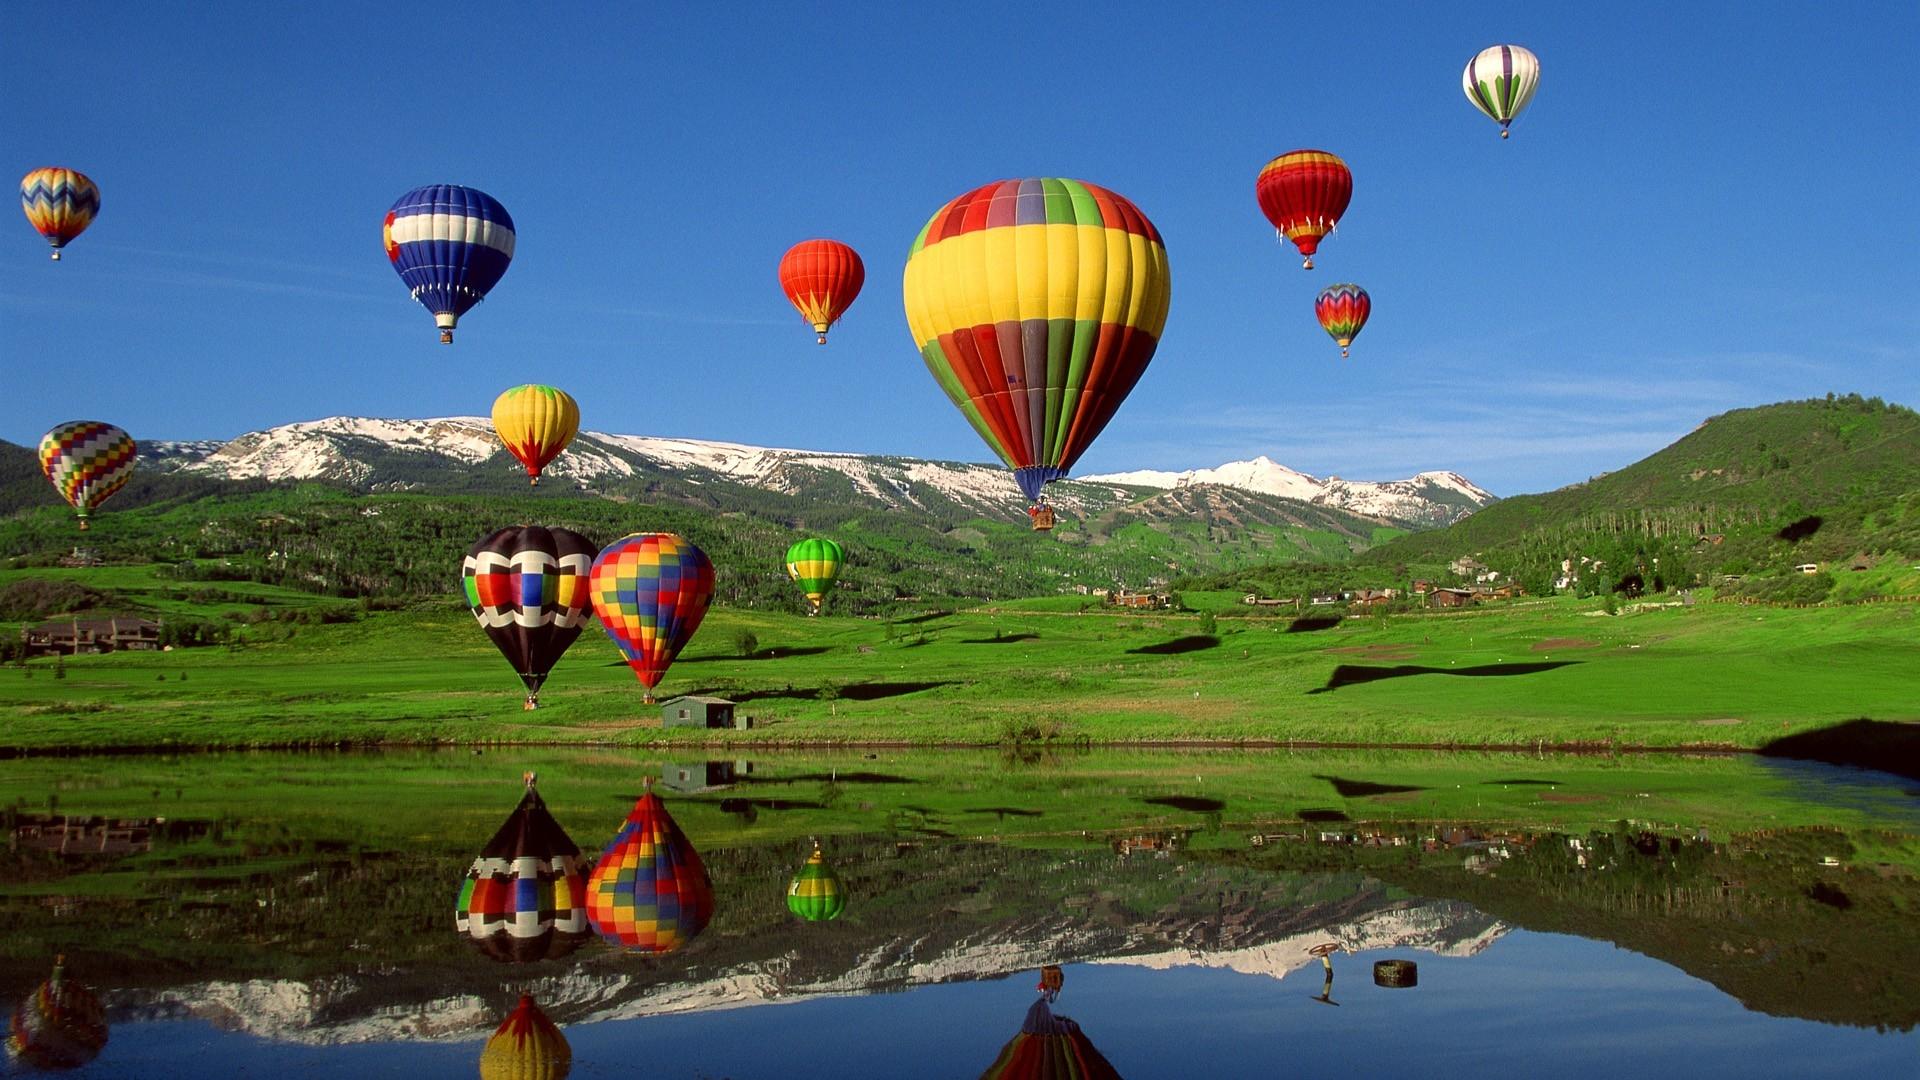 49+ Free Hot Air Balloon Wallpaper on WallpaperSafari